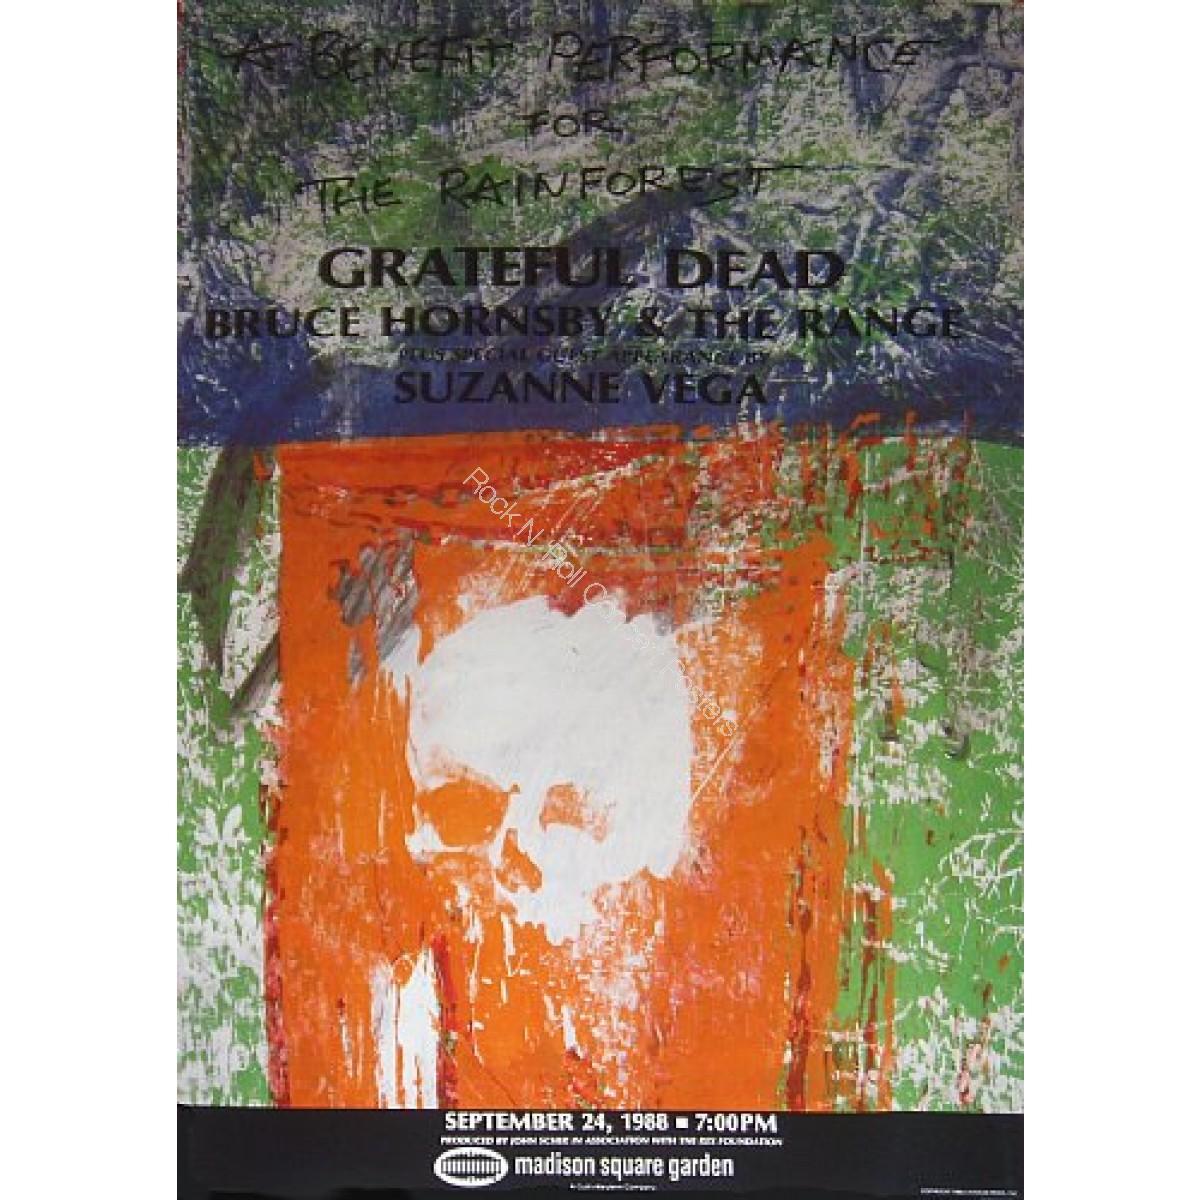 The Grateful Dead Madison Square Garden New York City 9/24/88 Rainforest Benefit